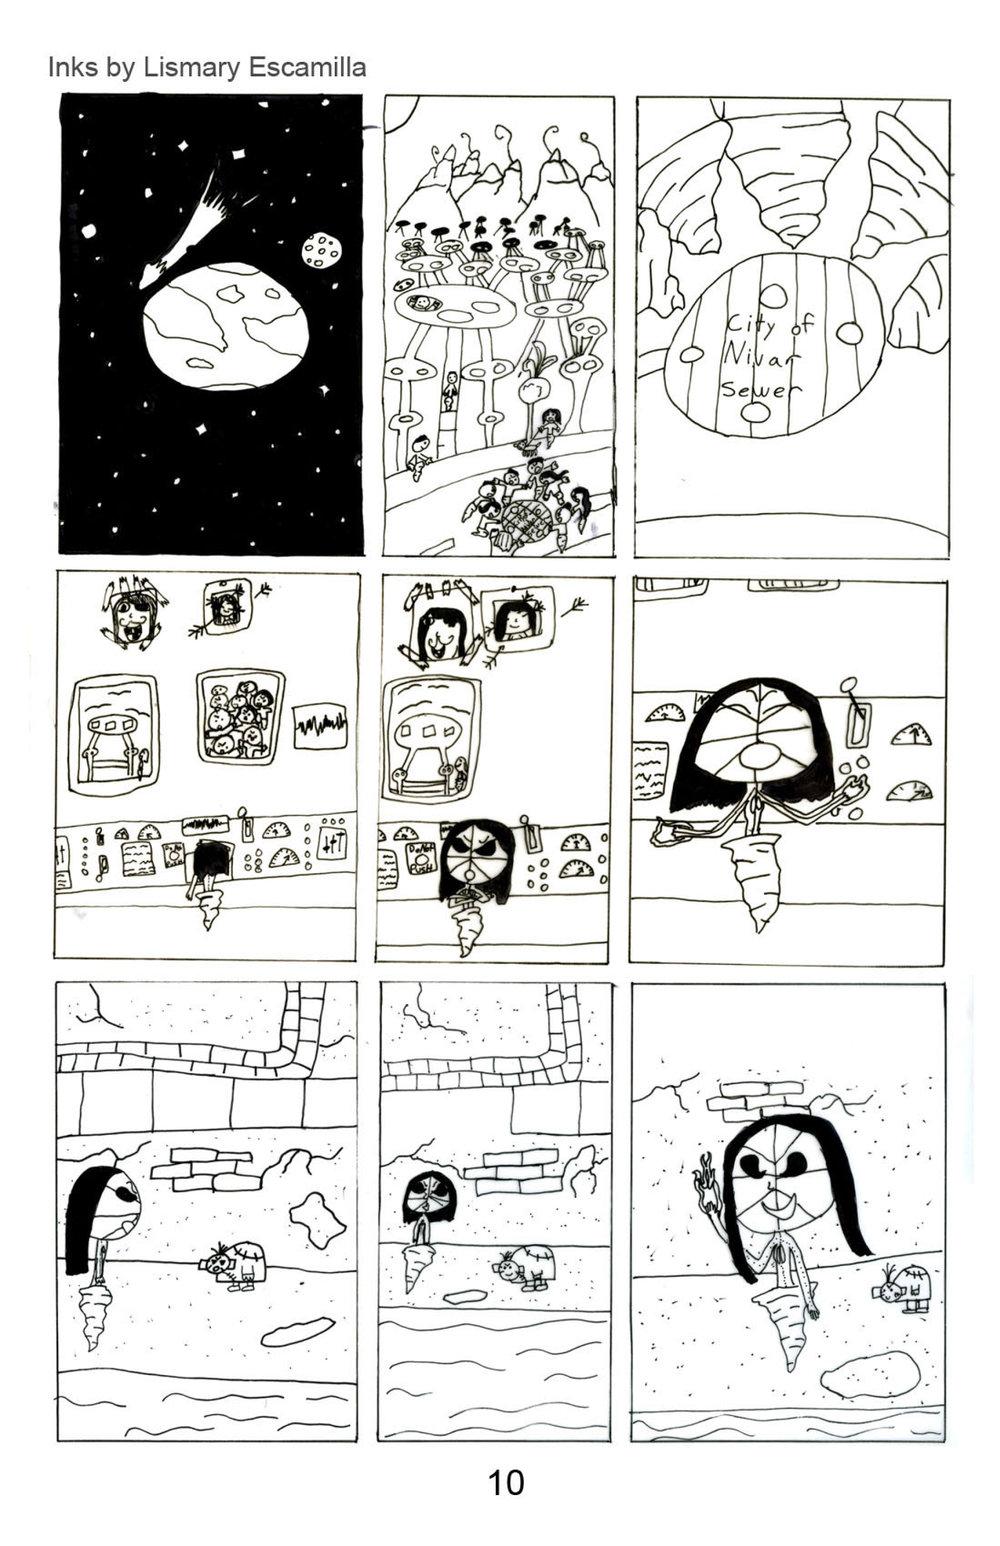 ev page 10.jpg